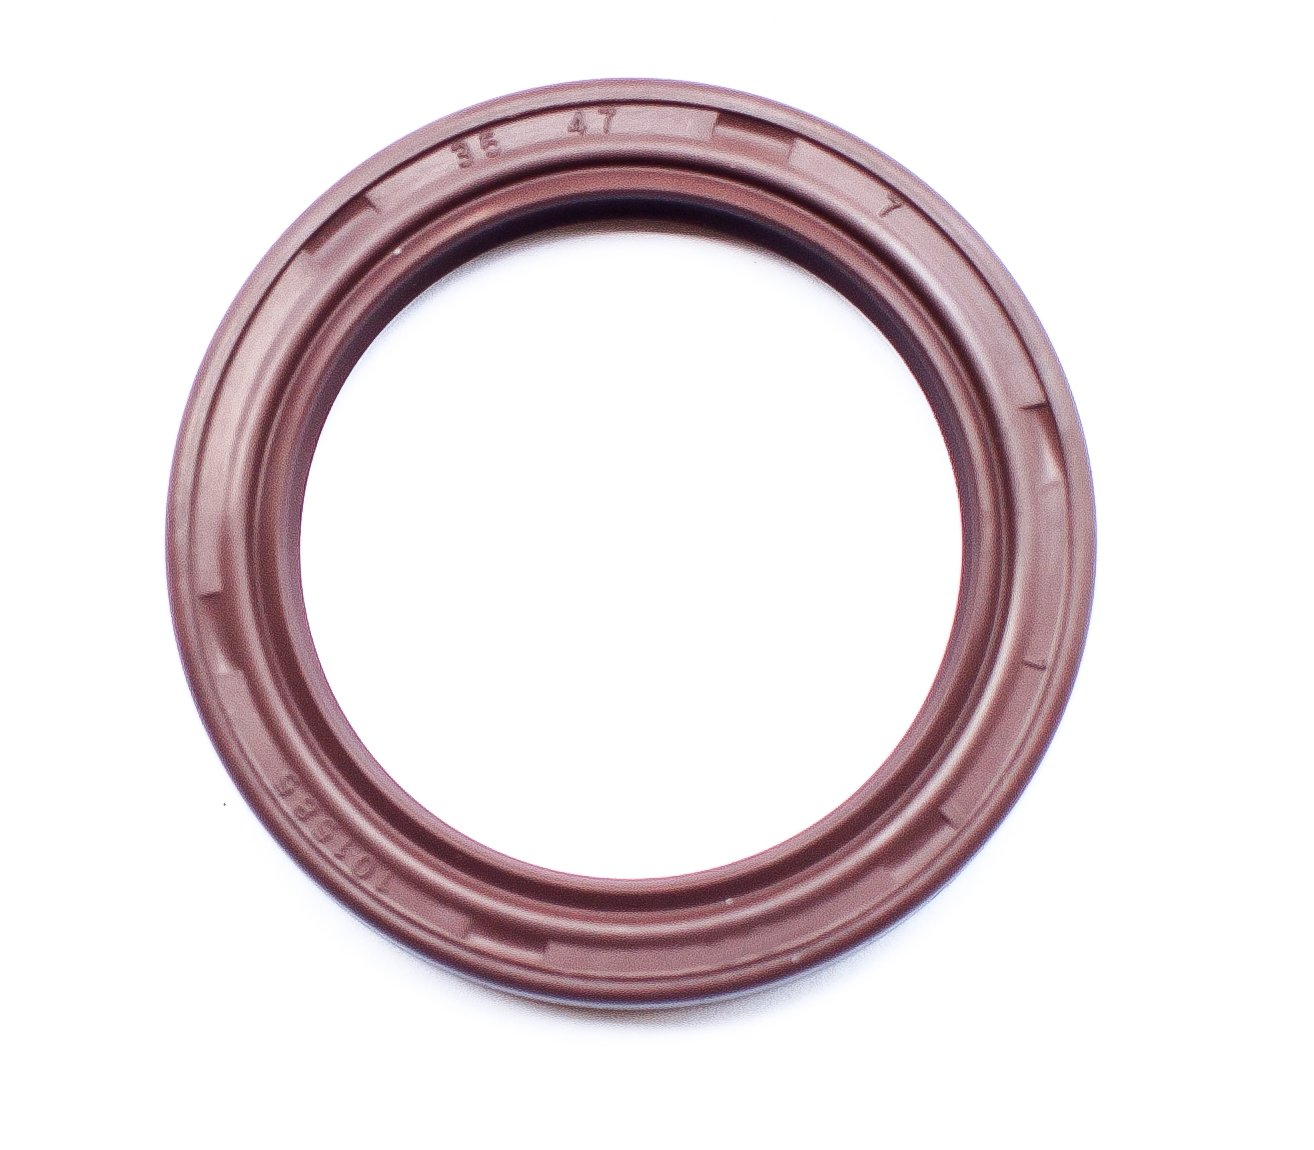 Oil Seal 35X47X7 (10 PCS) Viton Oil Seal Grease Seal TC |EAI Rubber Double Lip w/Garter Spring 35mmX47mmX7mm | 1.378''x1.850''x0.276''